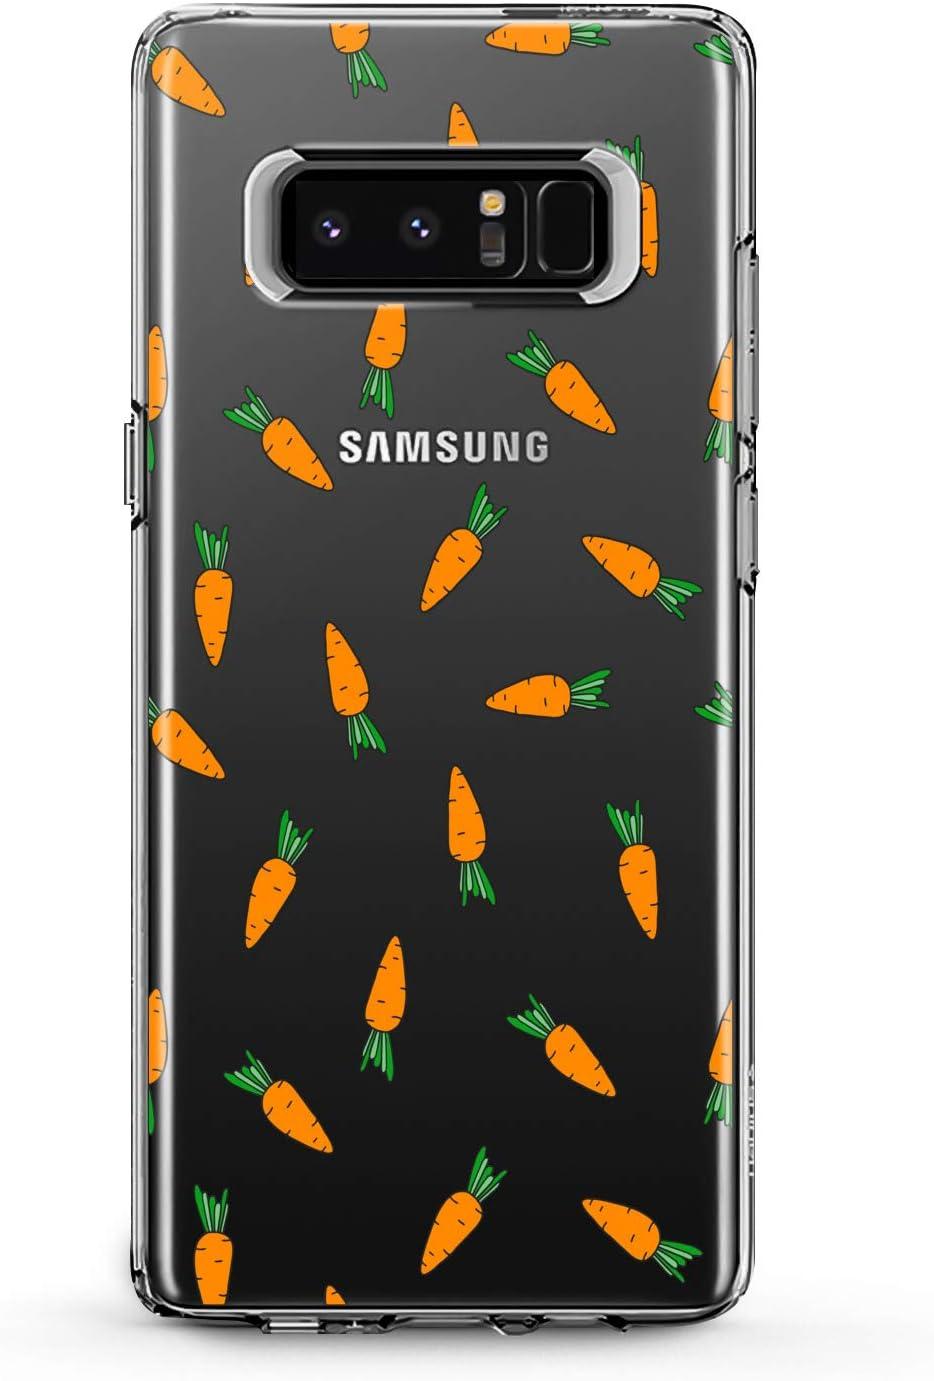 Anreda TPU Case Compatible with Samsung Galaxy J8 J7 Prime J6 Plus J5 J4 Core J2 Smooth Cover Print Art Design Carrots Pattern Food Clear Cute Bright Kids Orange Bunny Lady Soft Flexible Gift Slim fit